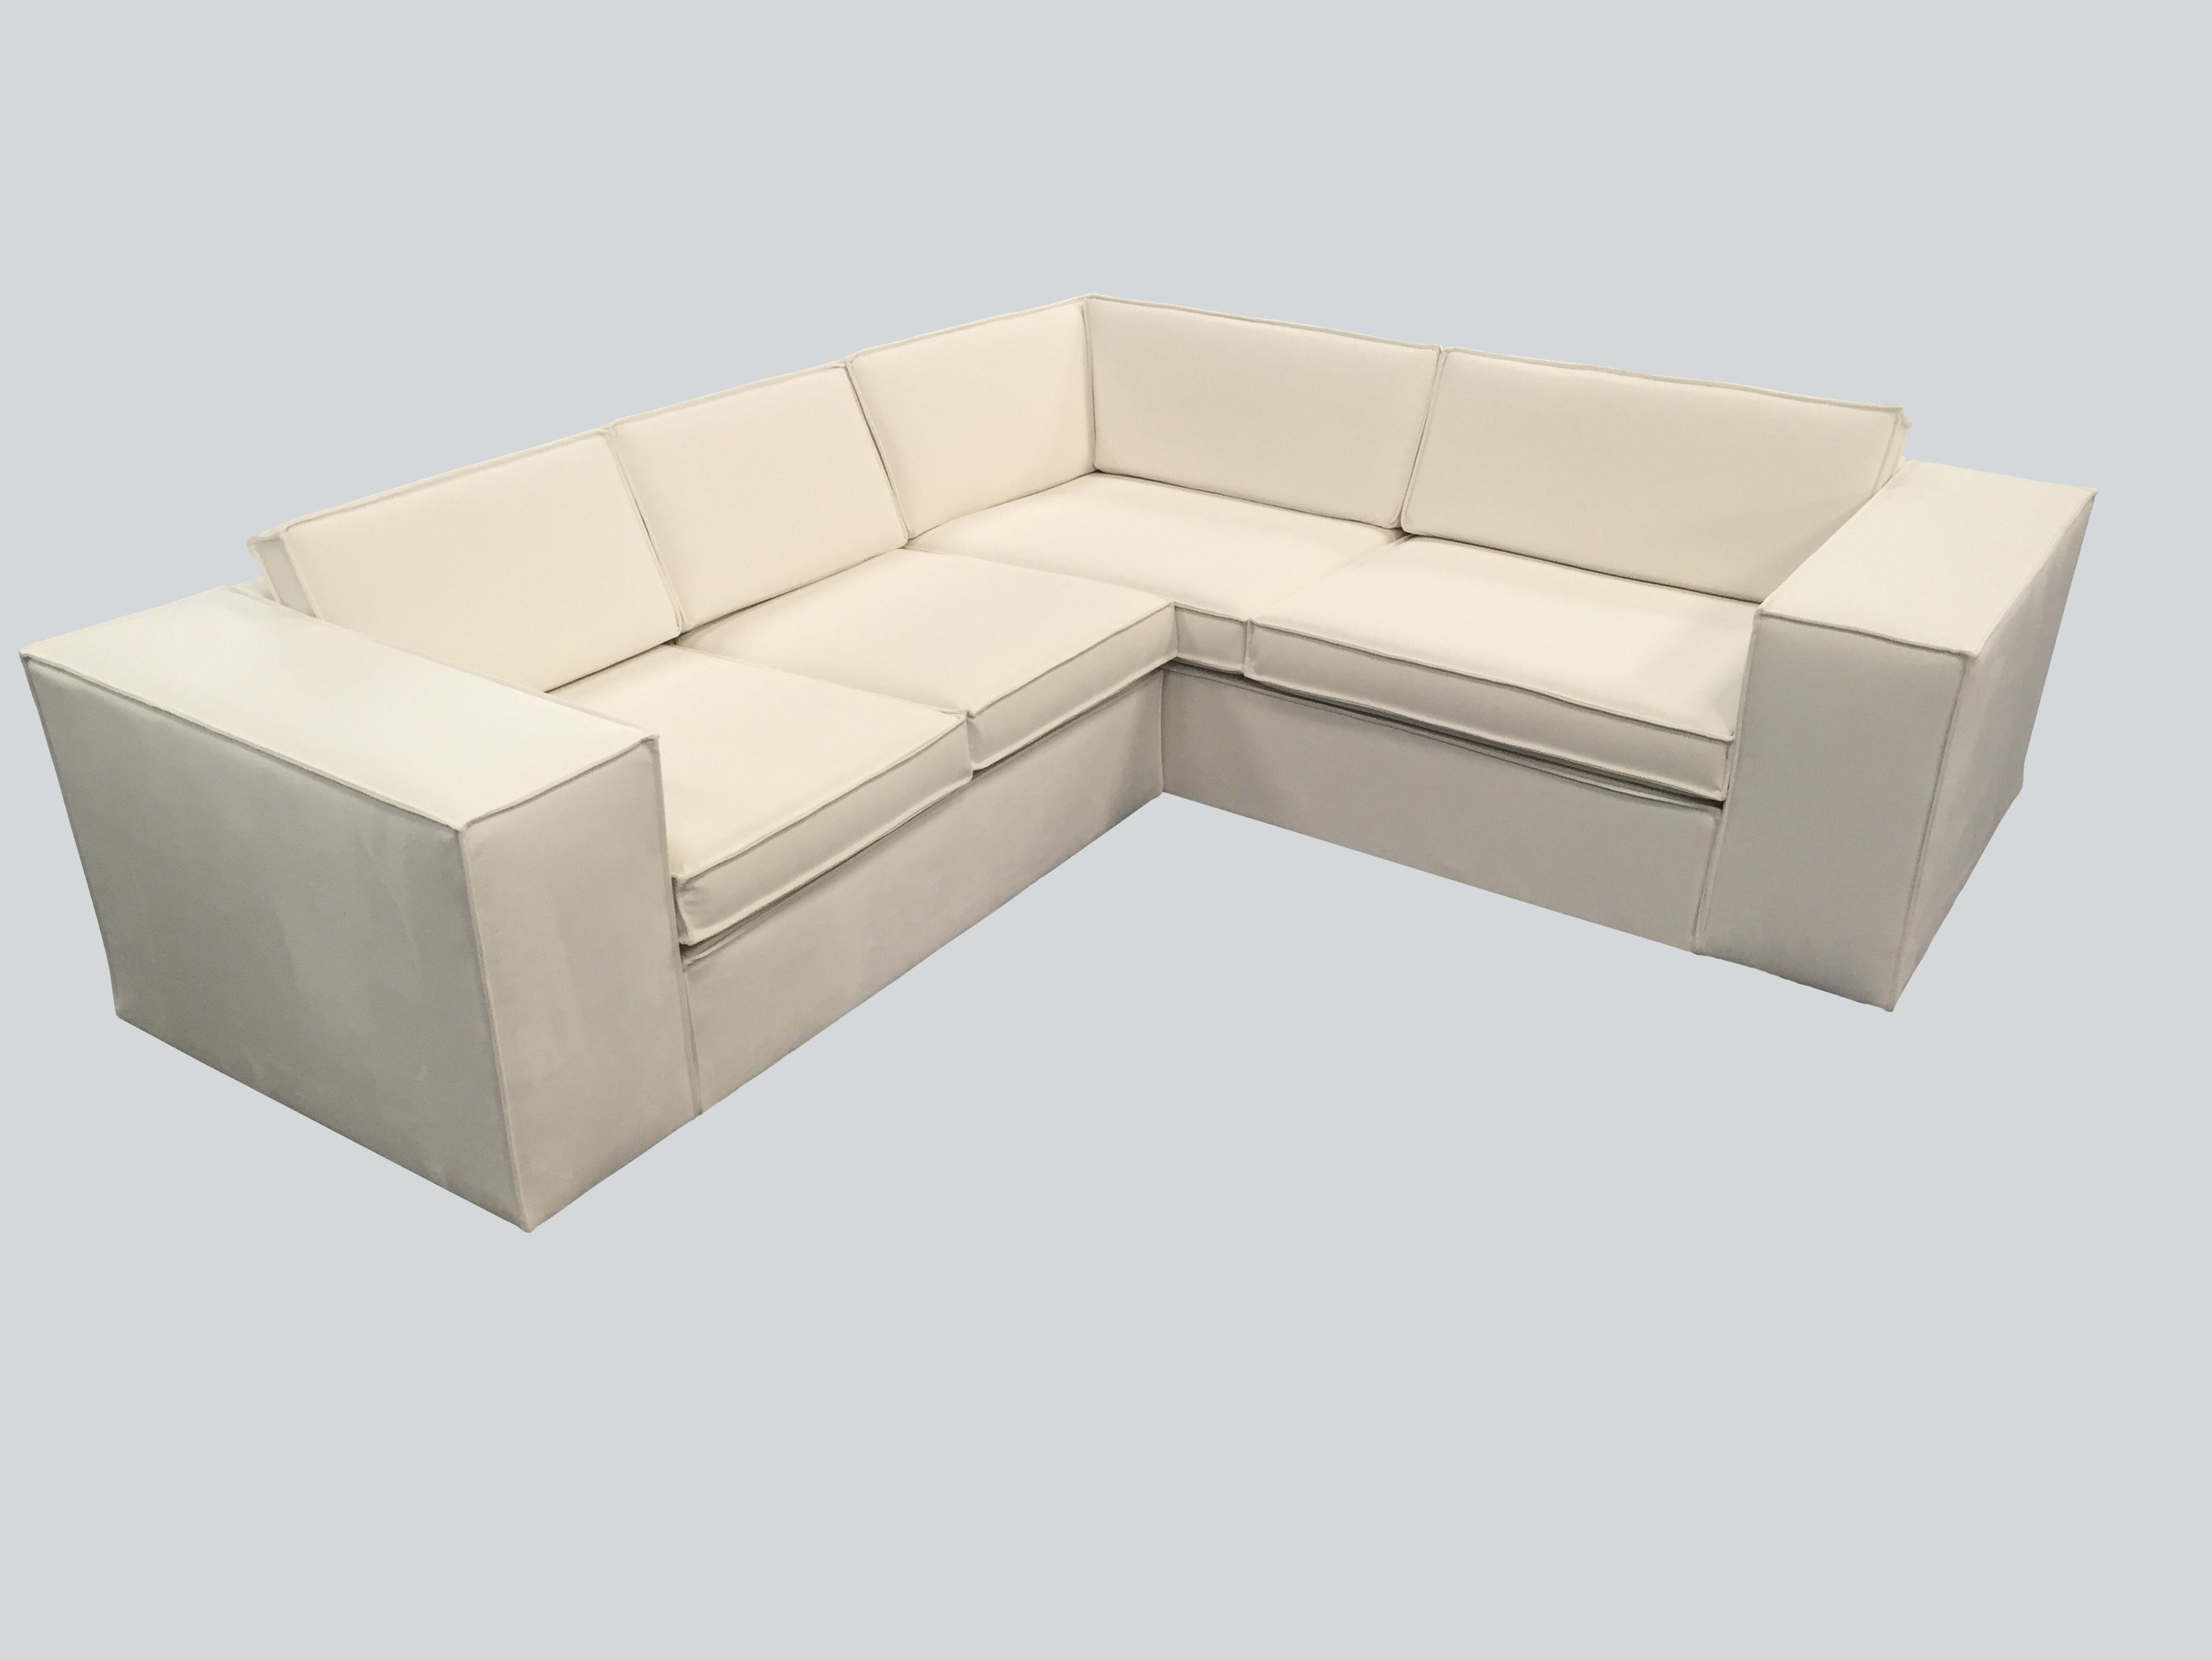 Rtw6 Corner Sofa With Seam Stitch Option Similar To Our Seam Sofa